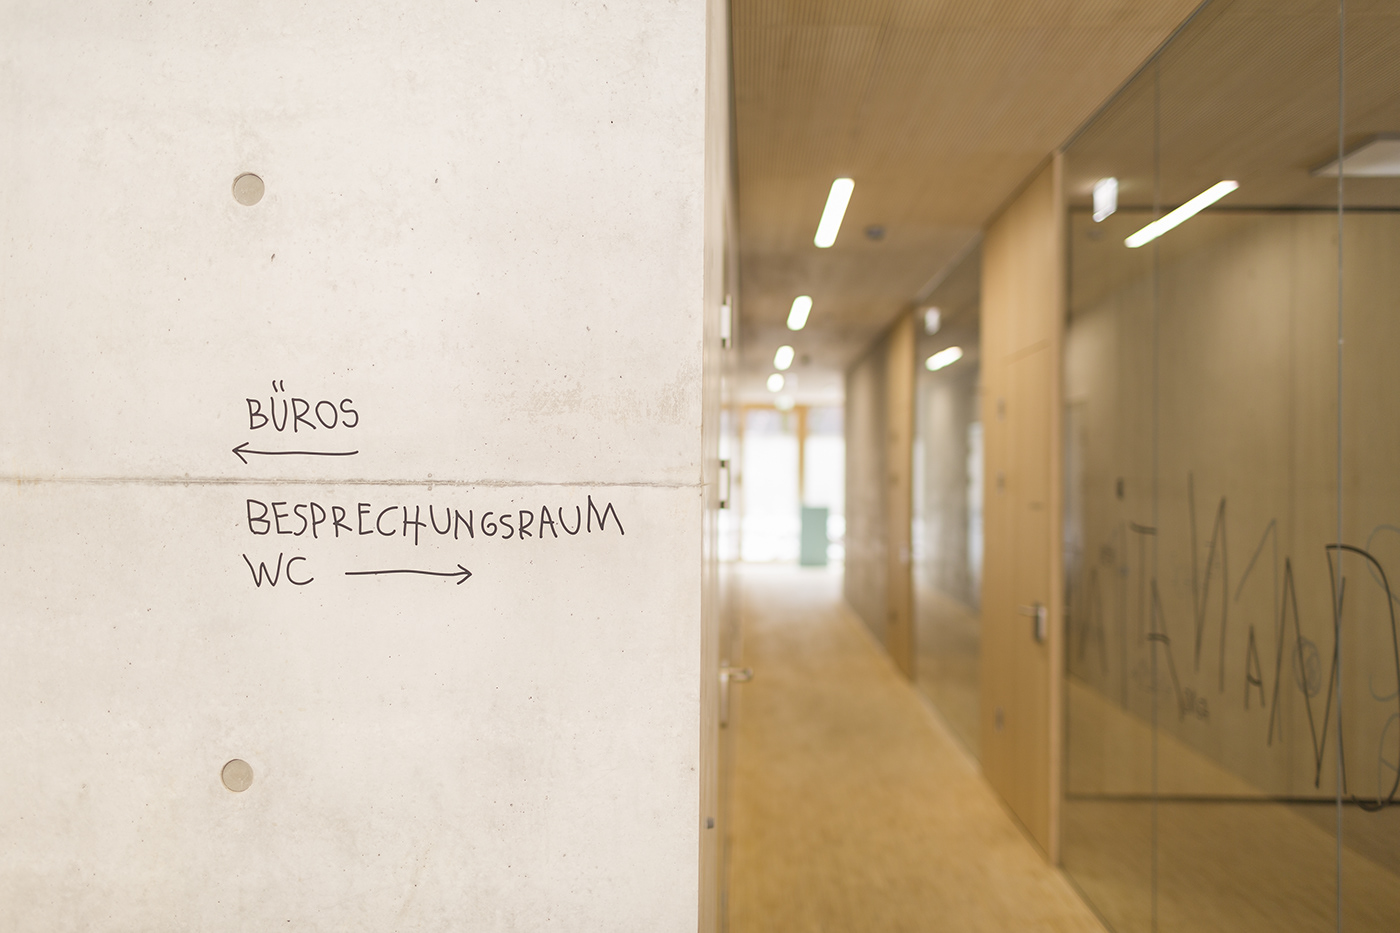 Marktstrasse 幼儿园标识设计 © Sägenvier DesignKommunikation